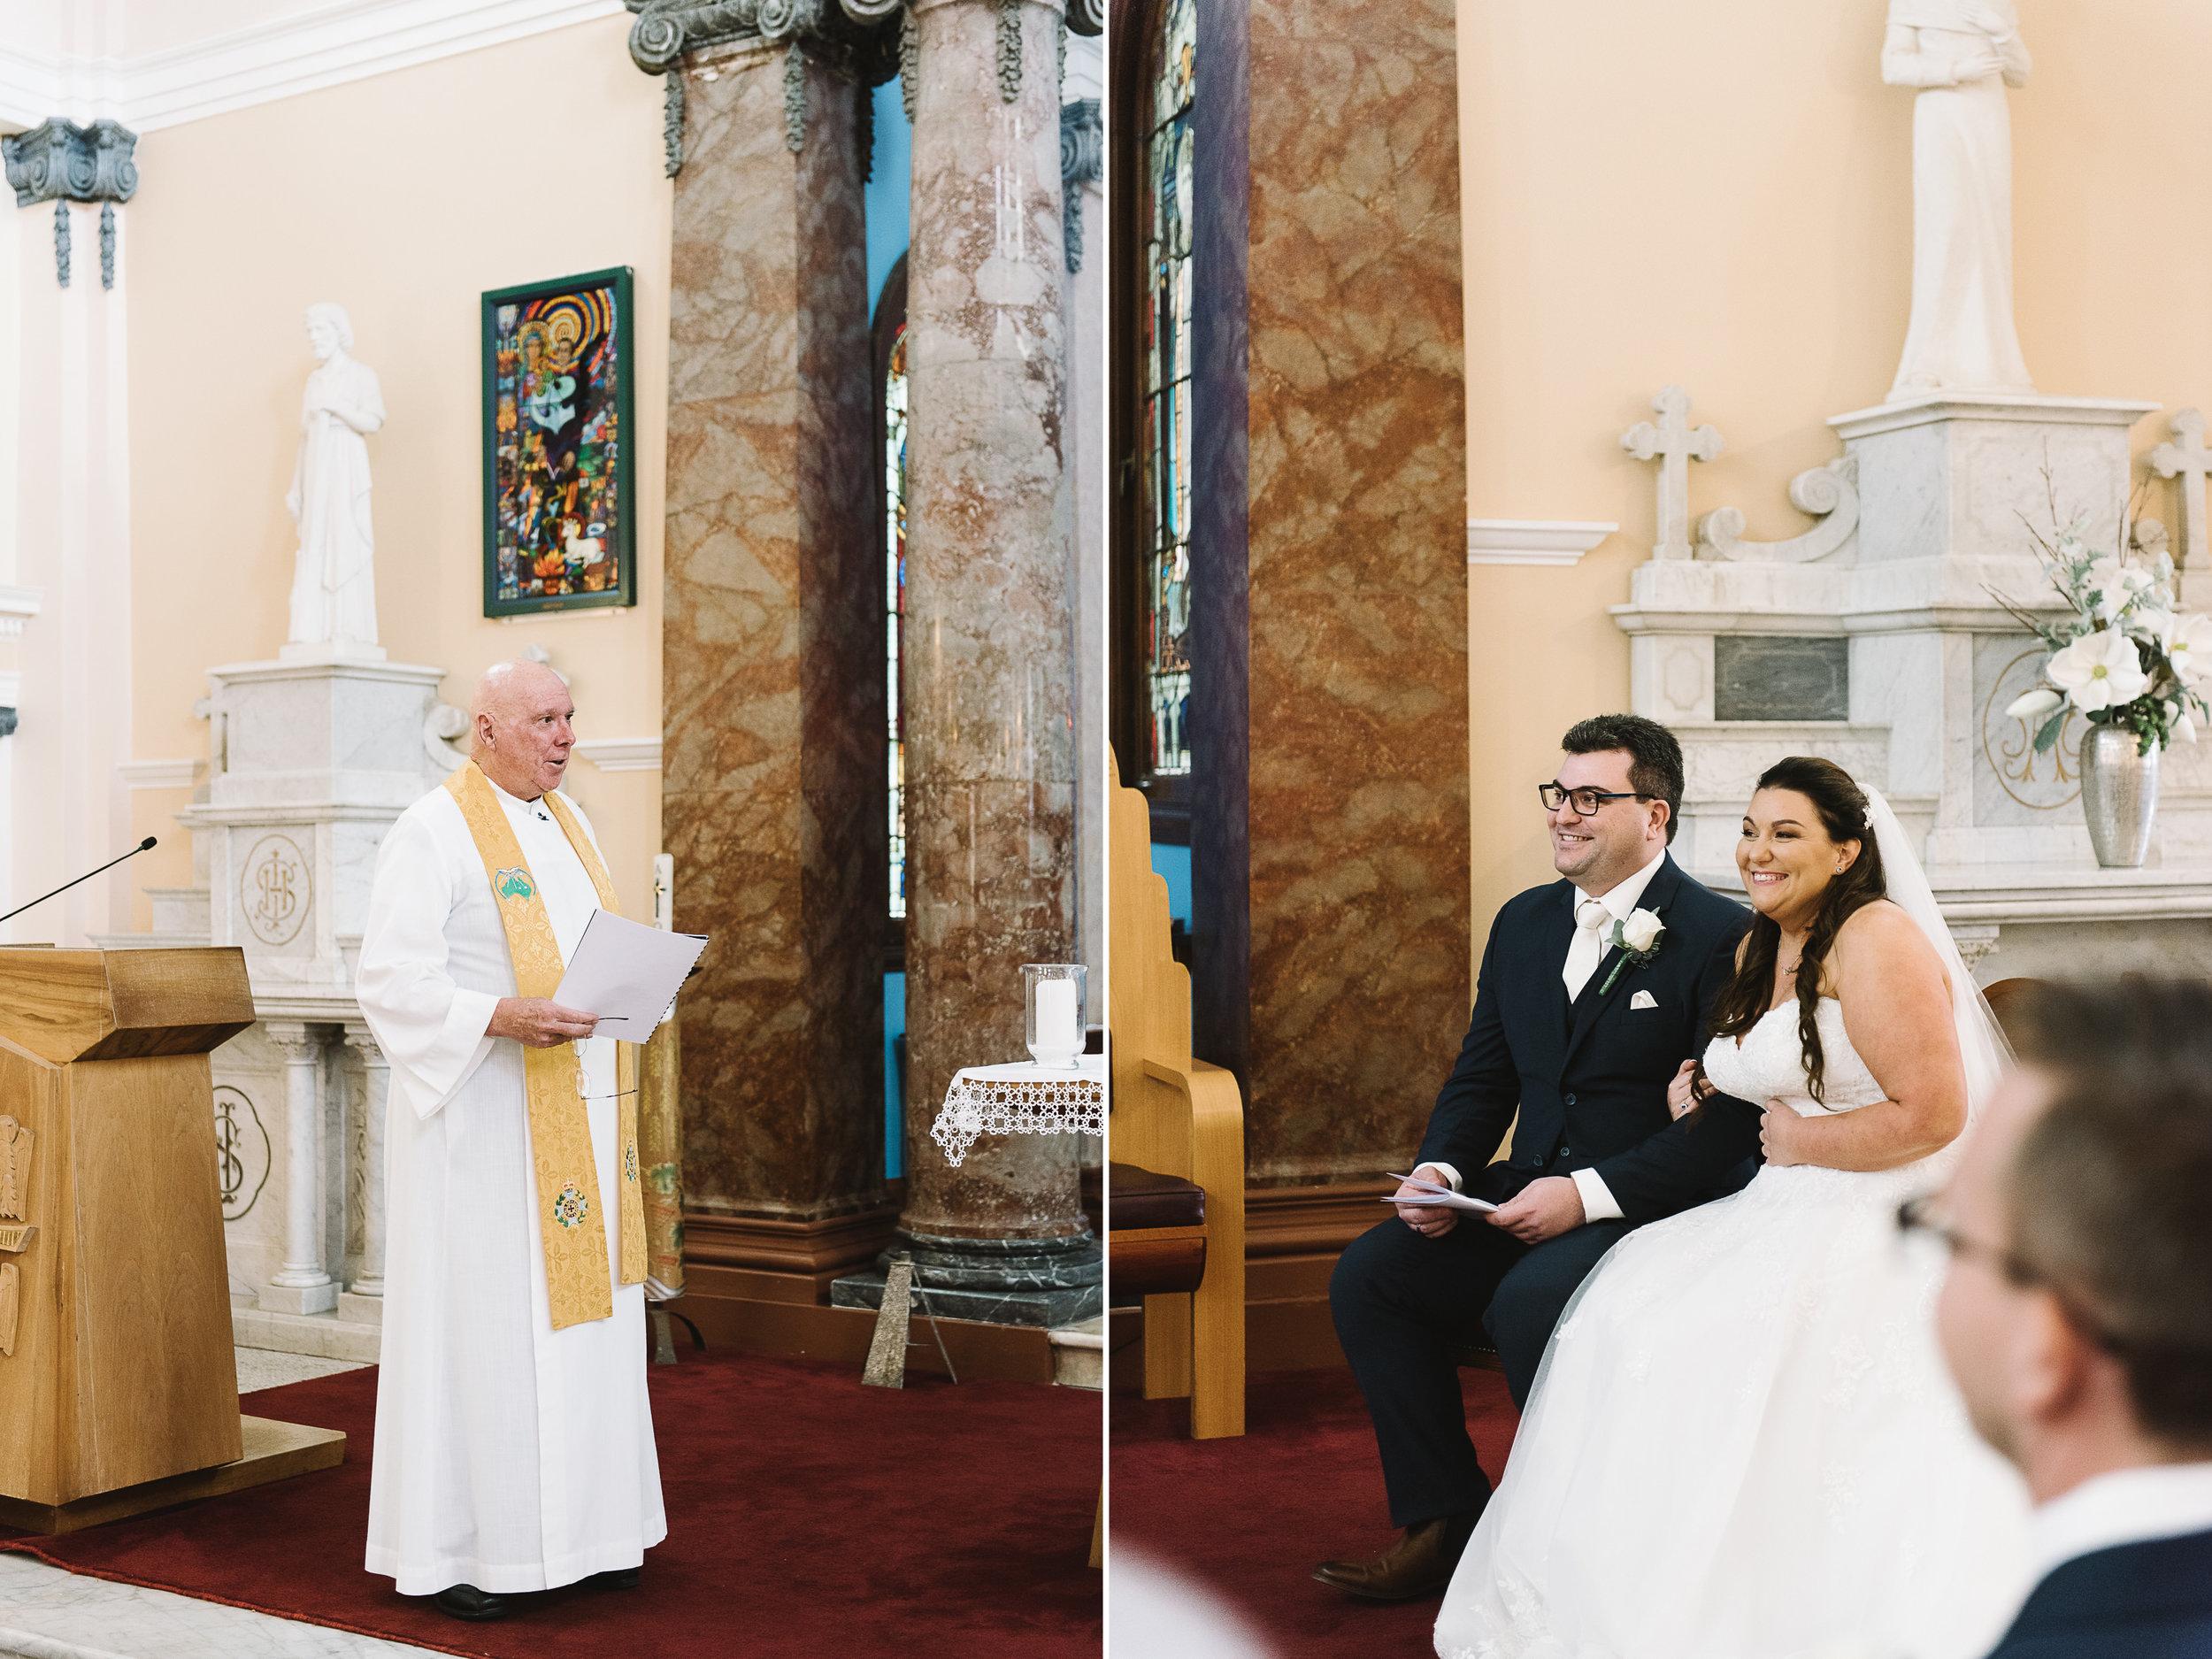 nudgee-college-wedding-19.jpg